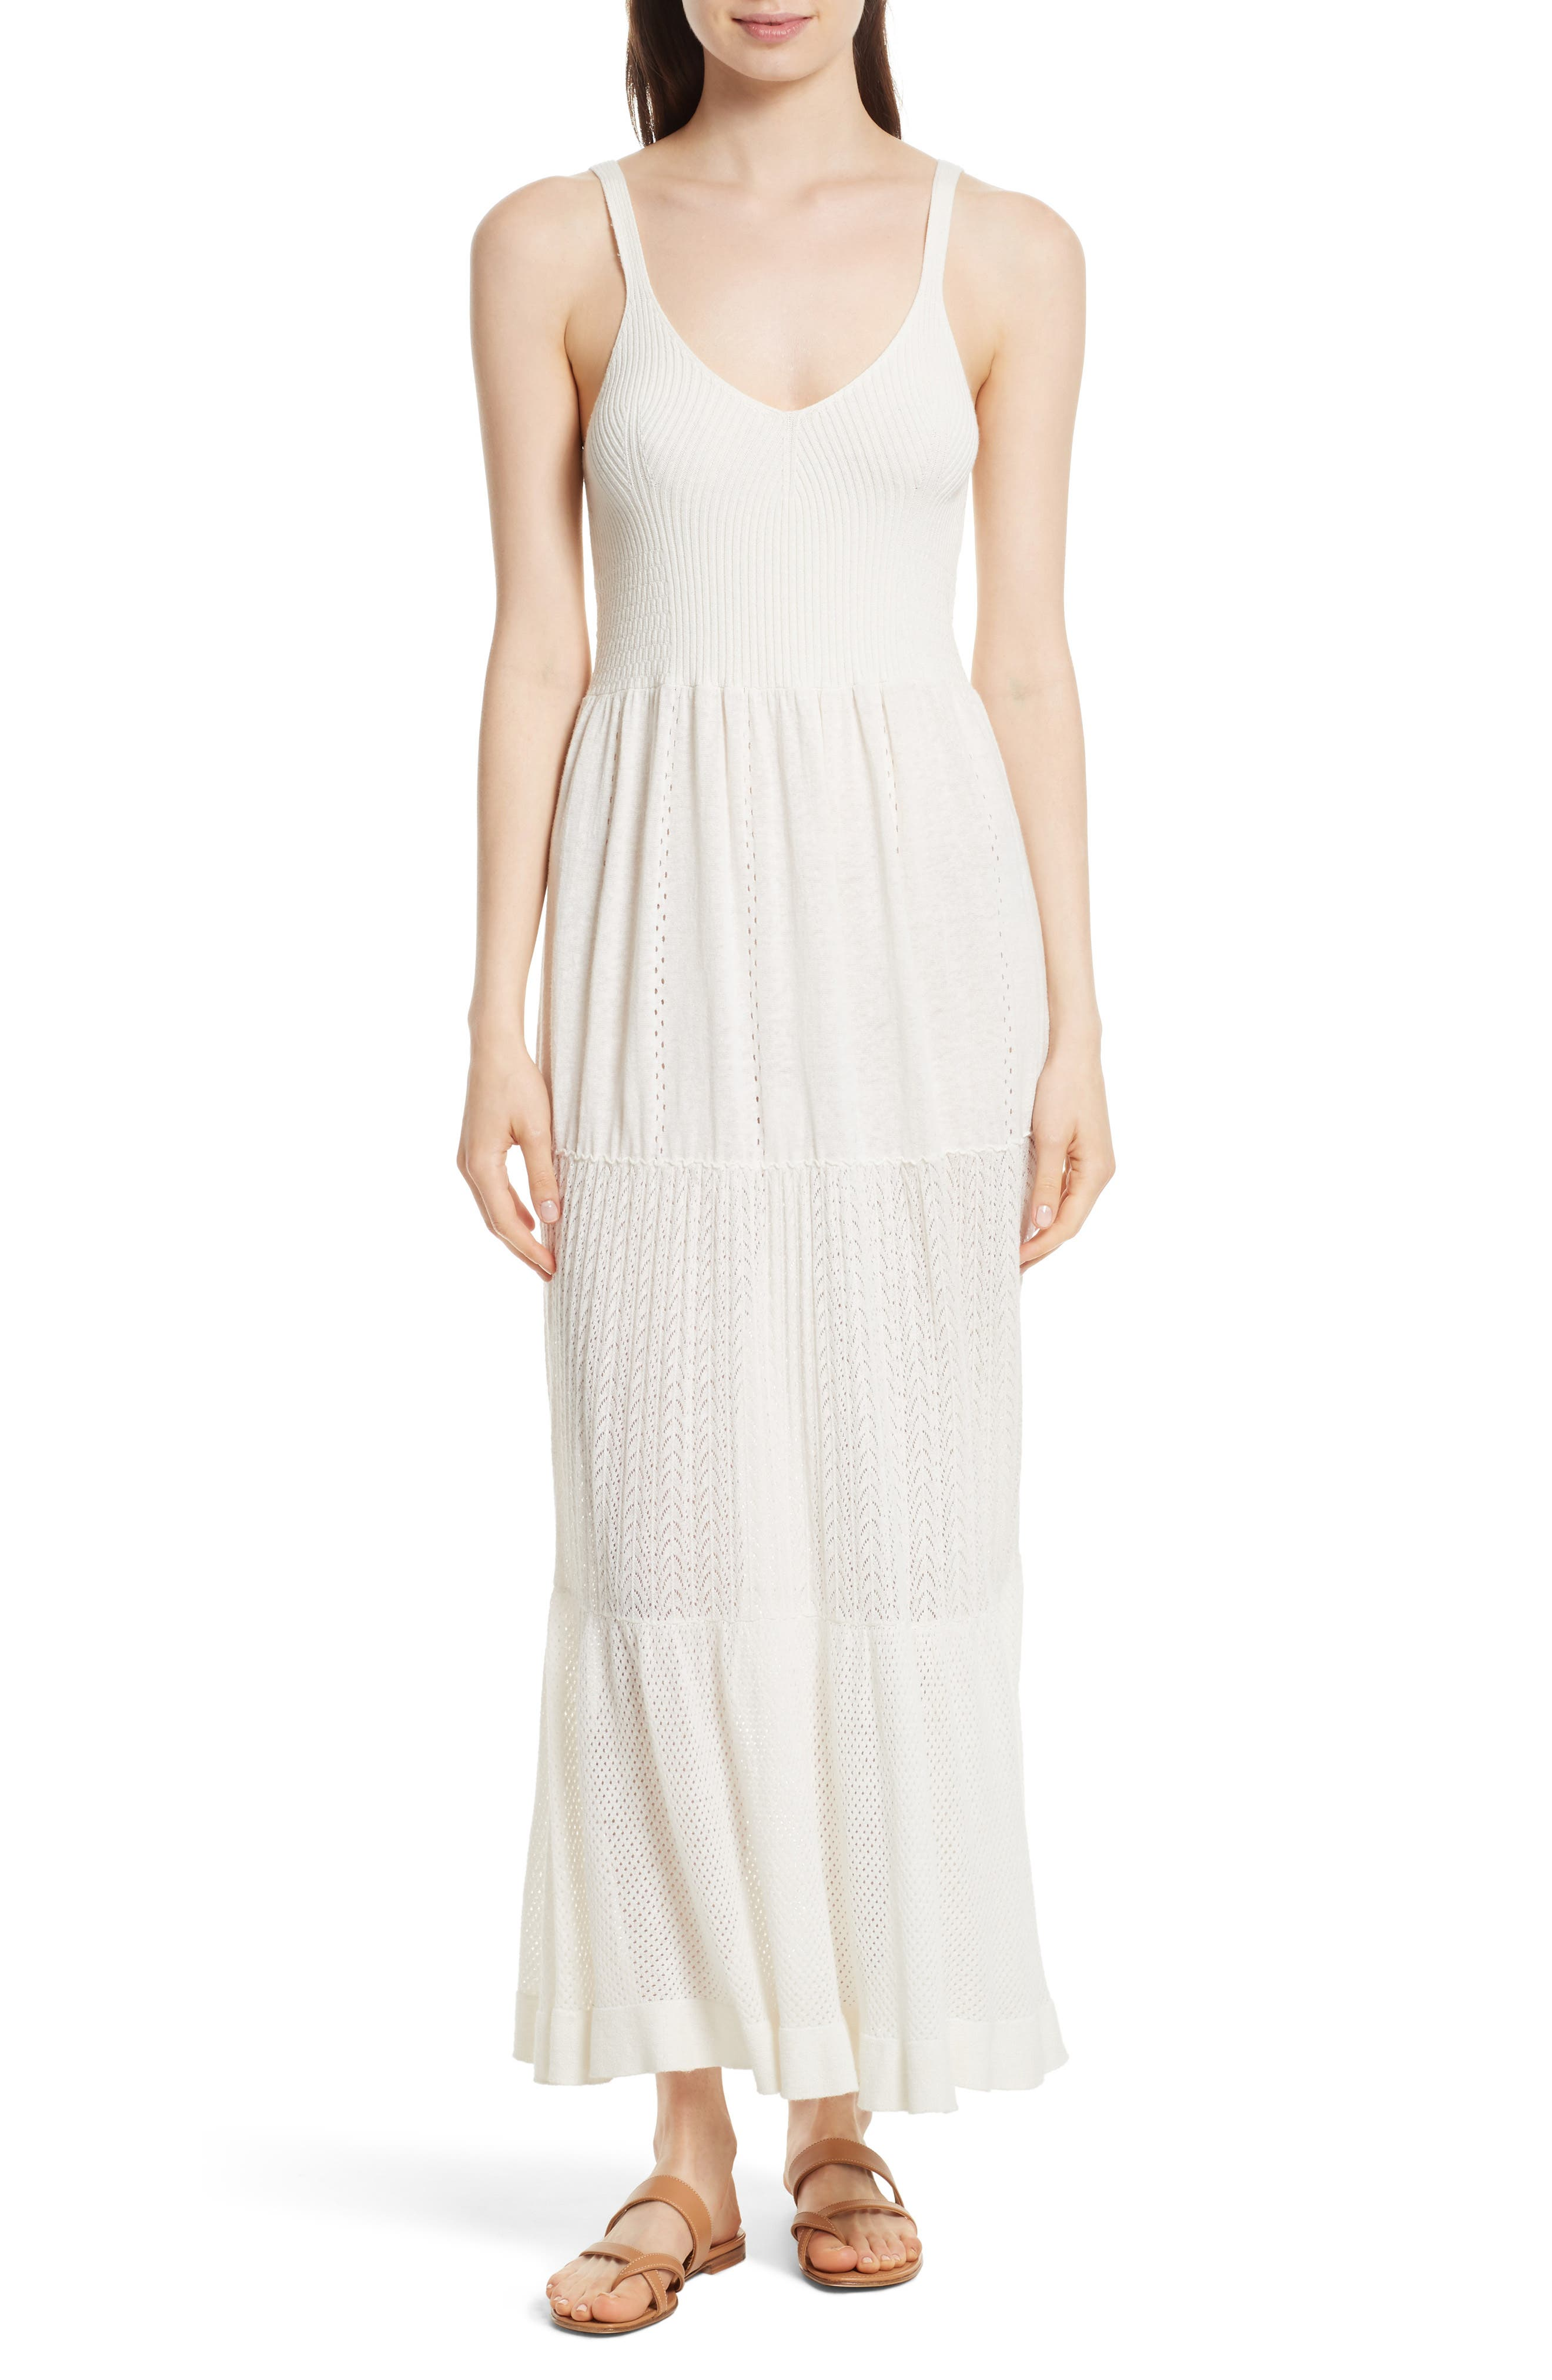 La Vie Rebecca Taylor Knit Maxi Dress